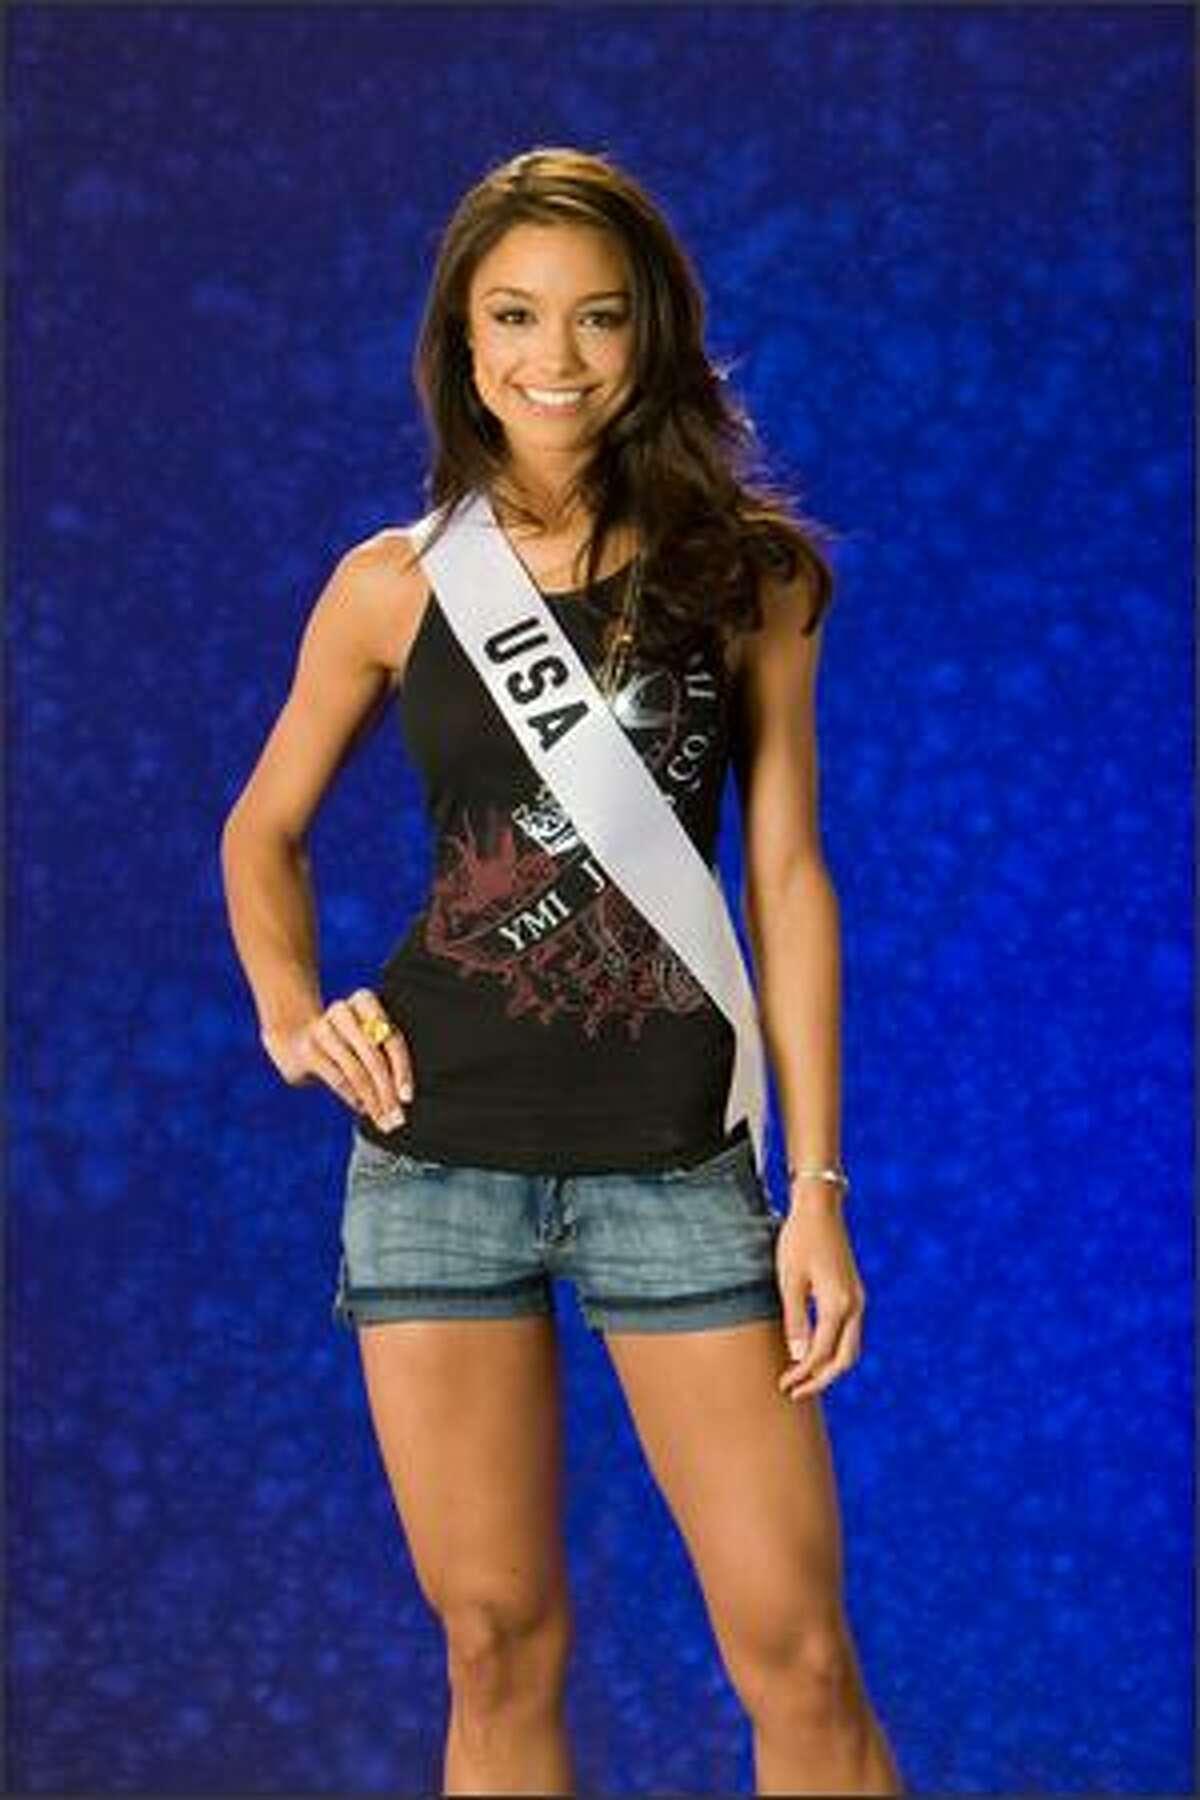 Rachel Smith, Miss USA 2007.